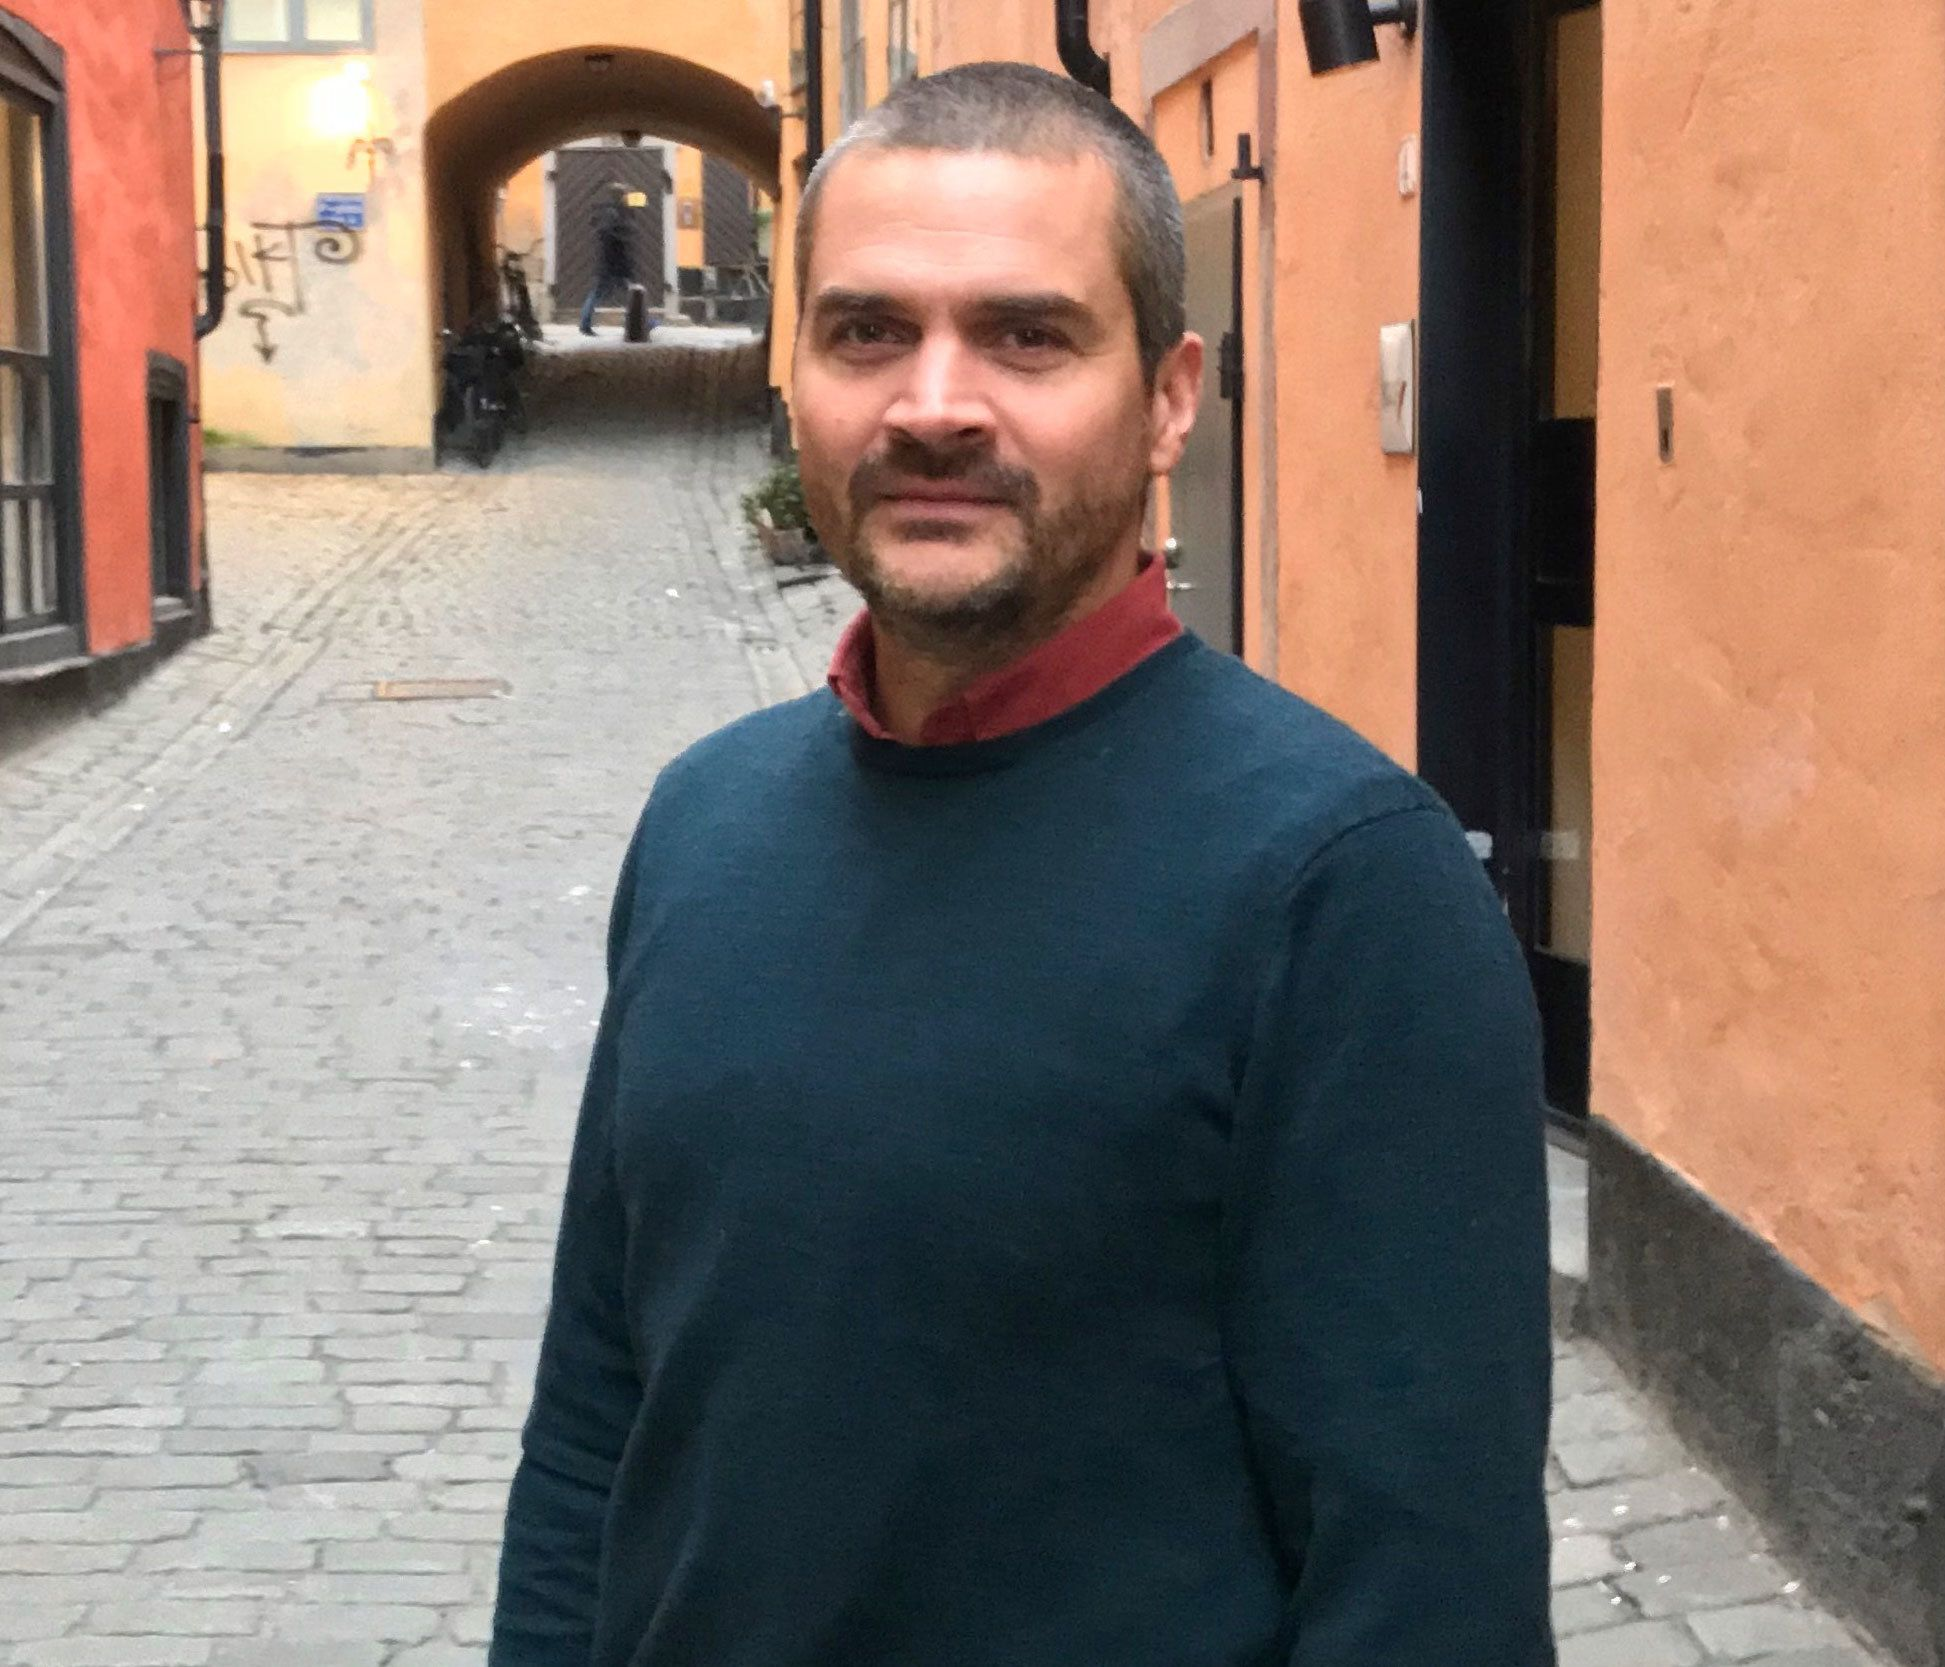 David Mühle, administrerende direktør i Playpilot.